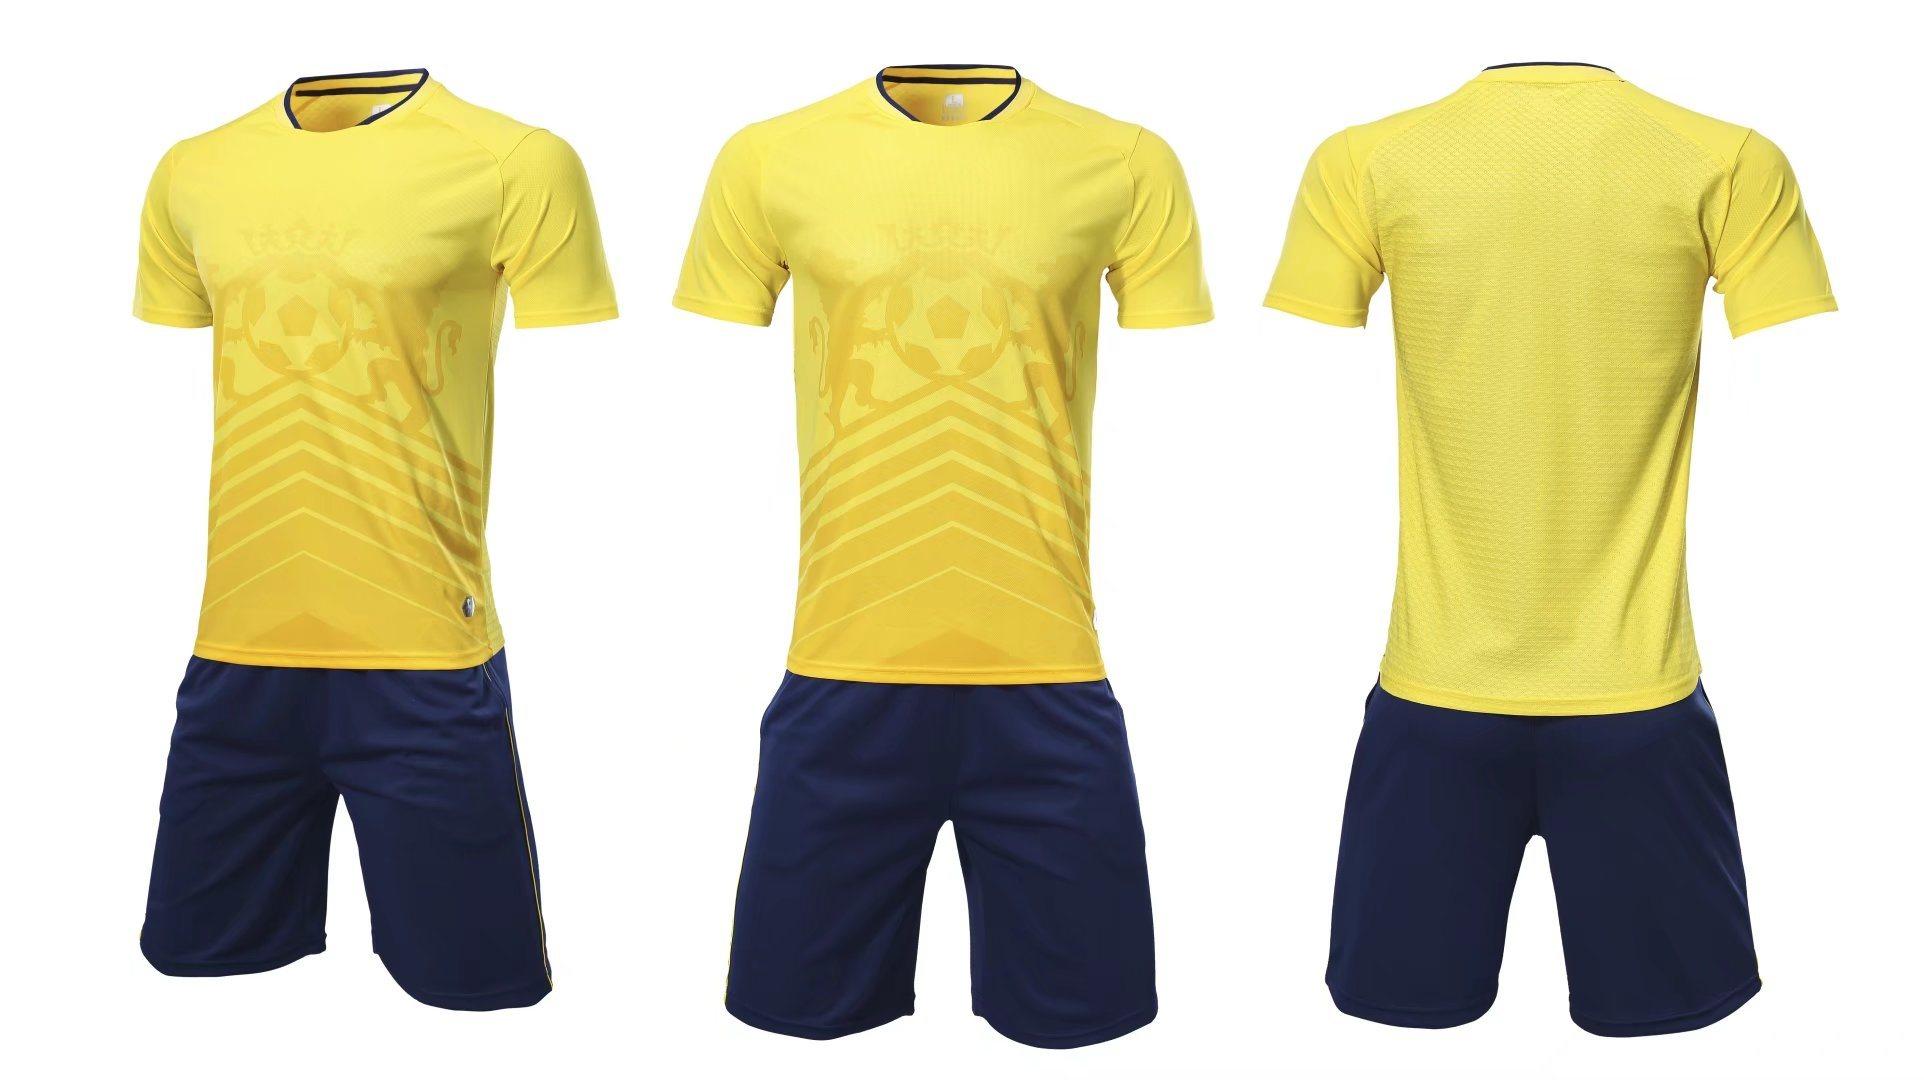 ff7e166a8fd Custom Sport Wear, Top Quality Soccer Jersey 100% Polyester ...